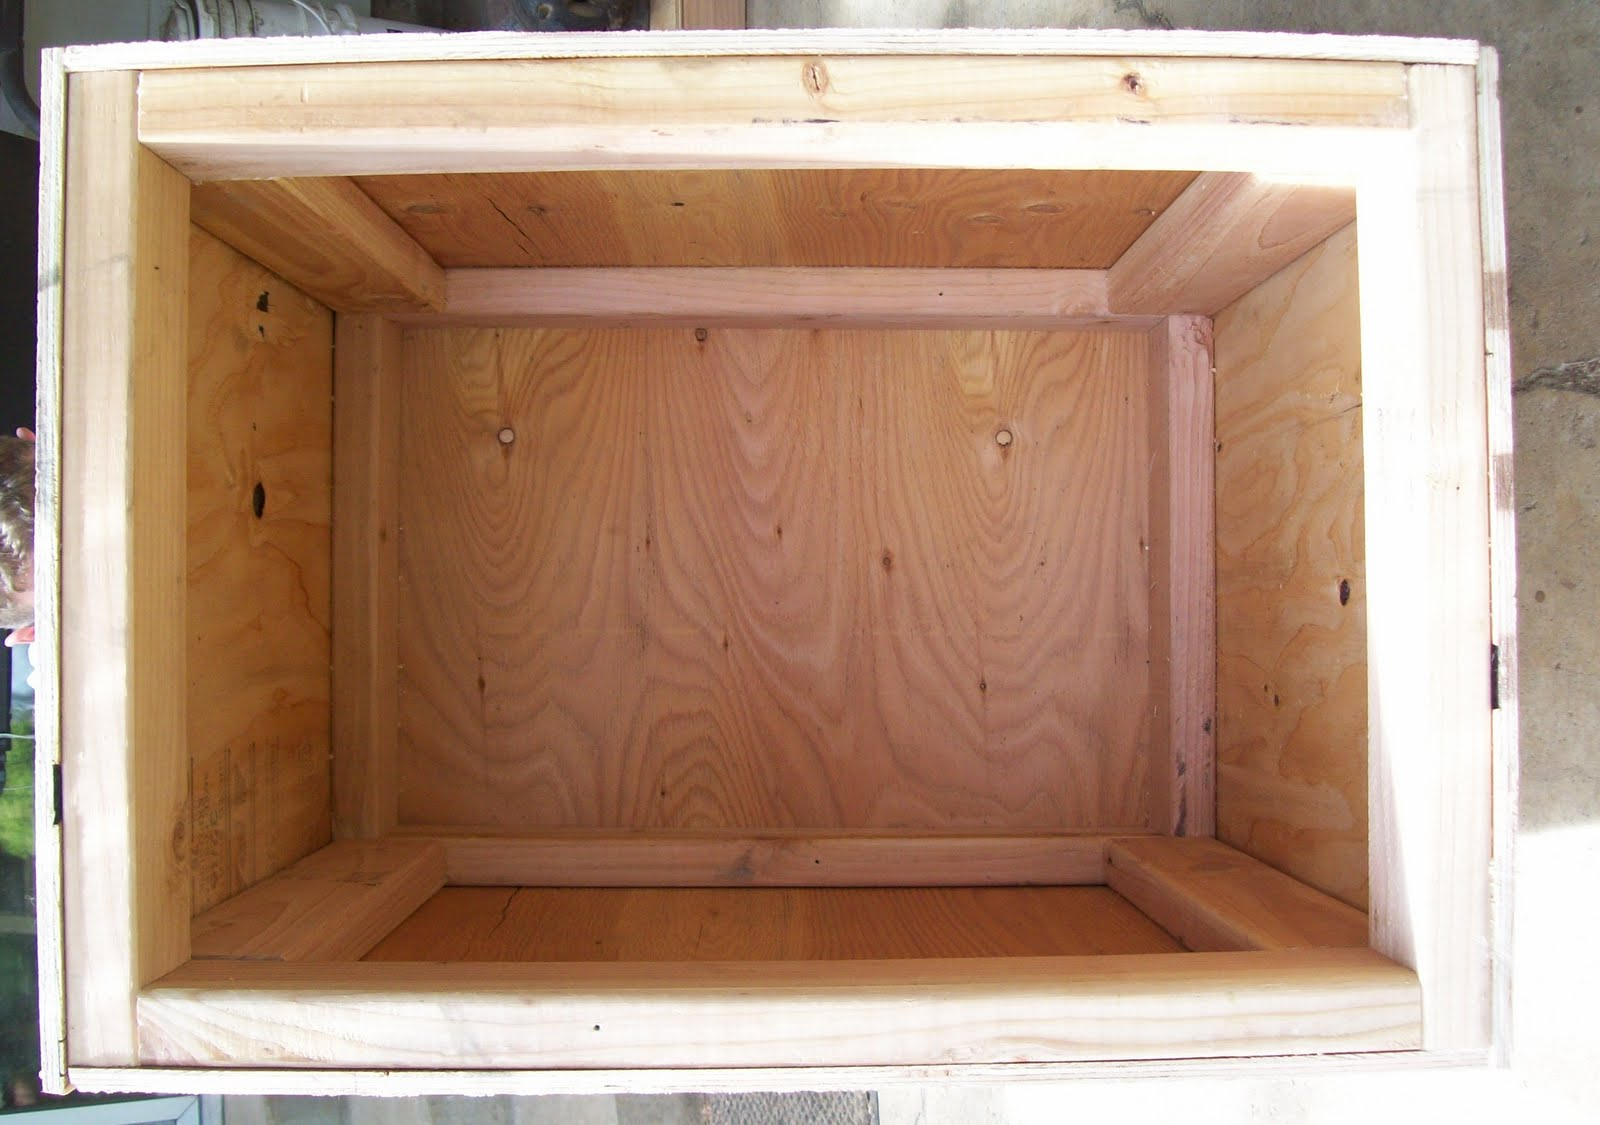 David Easy Firewood Box Plan Wood Plans US UK CA